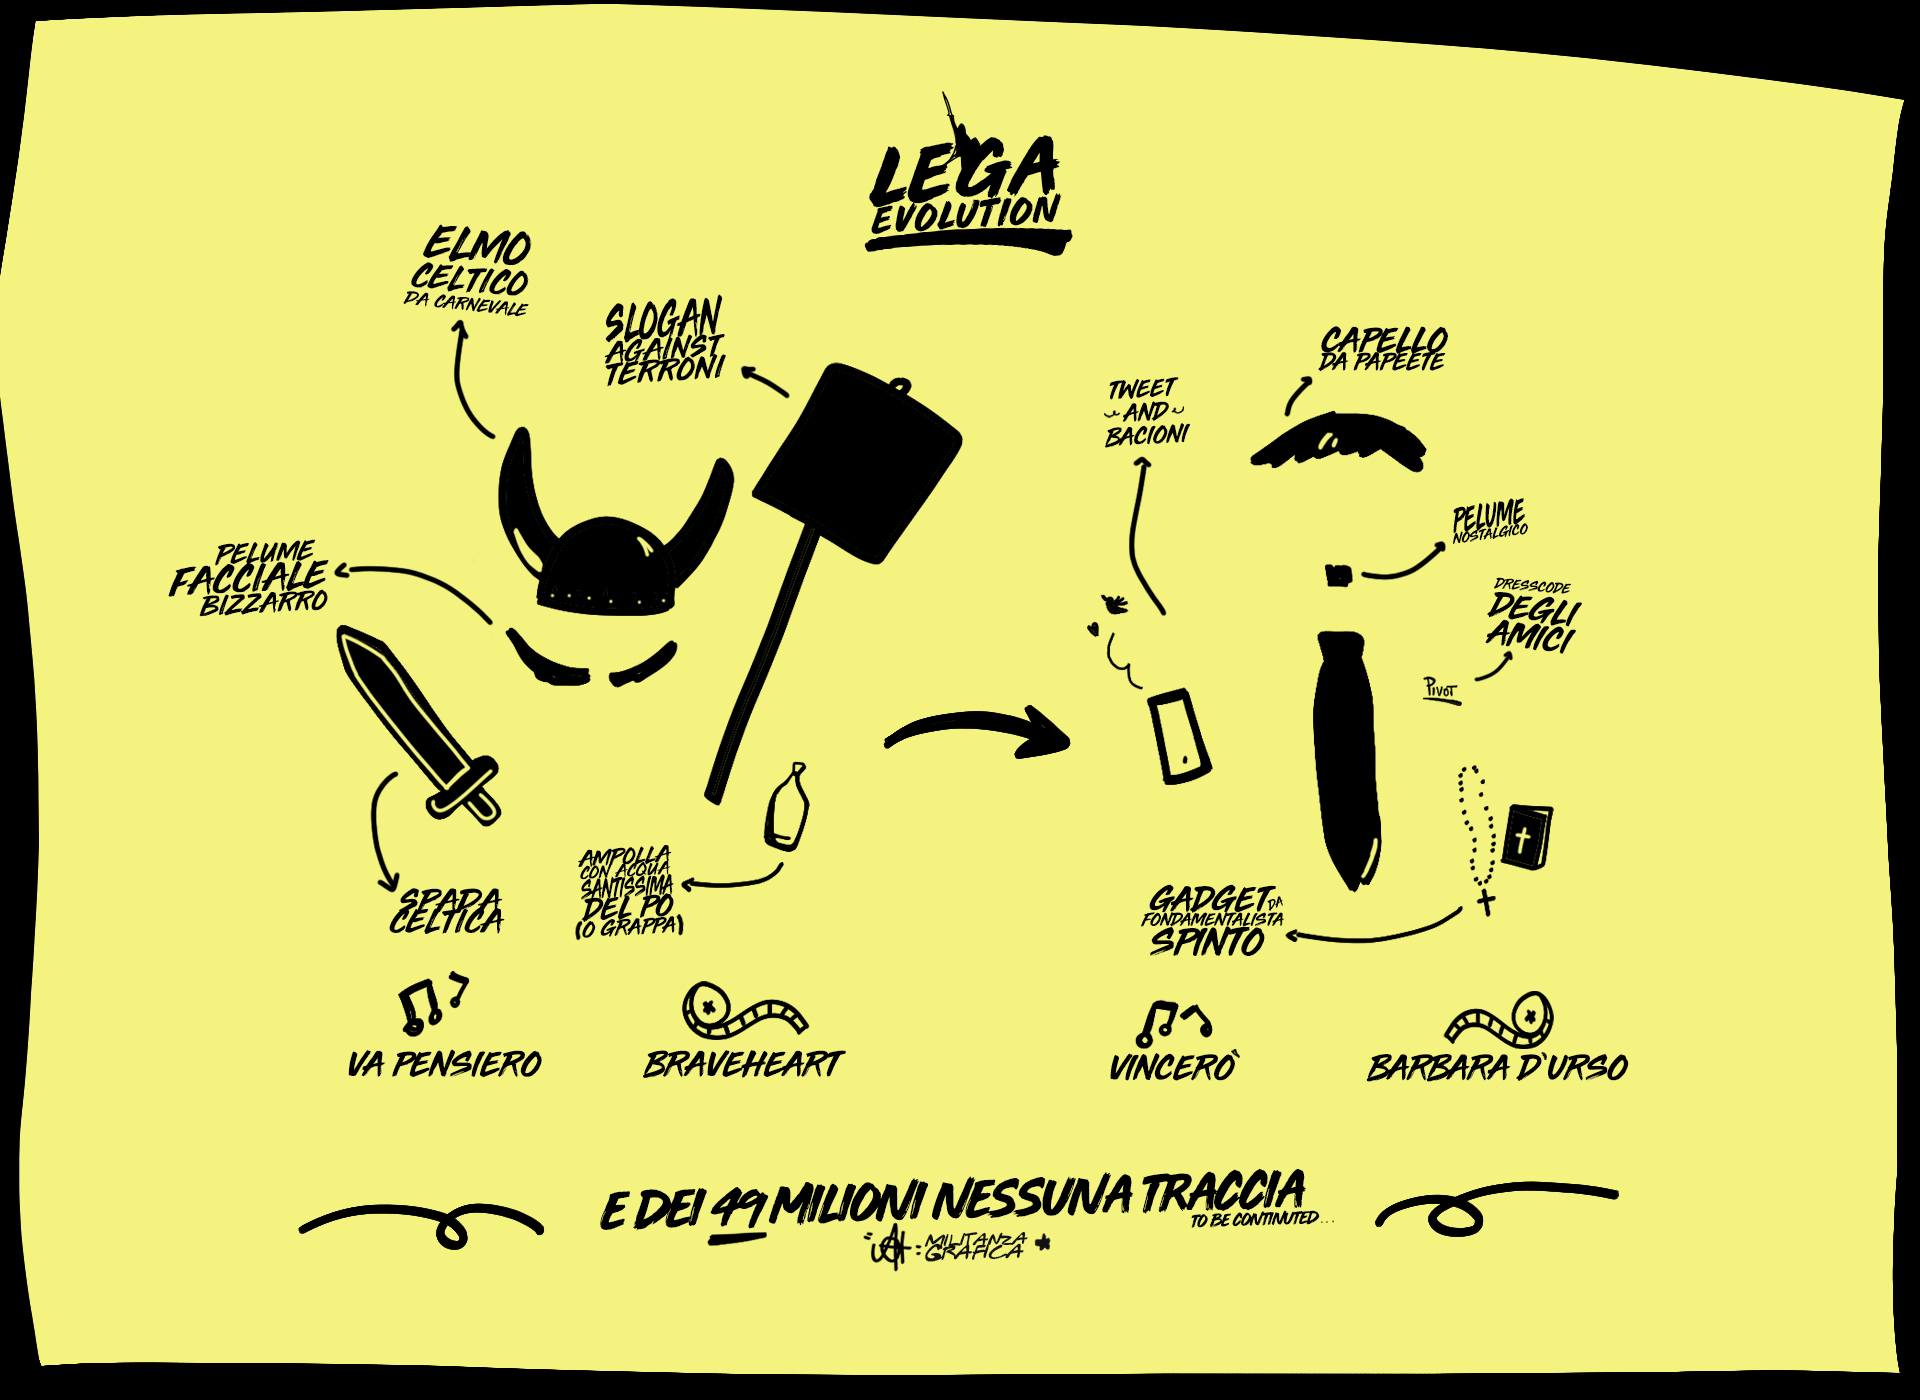 Lega Evolution